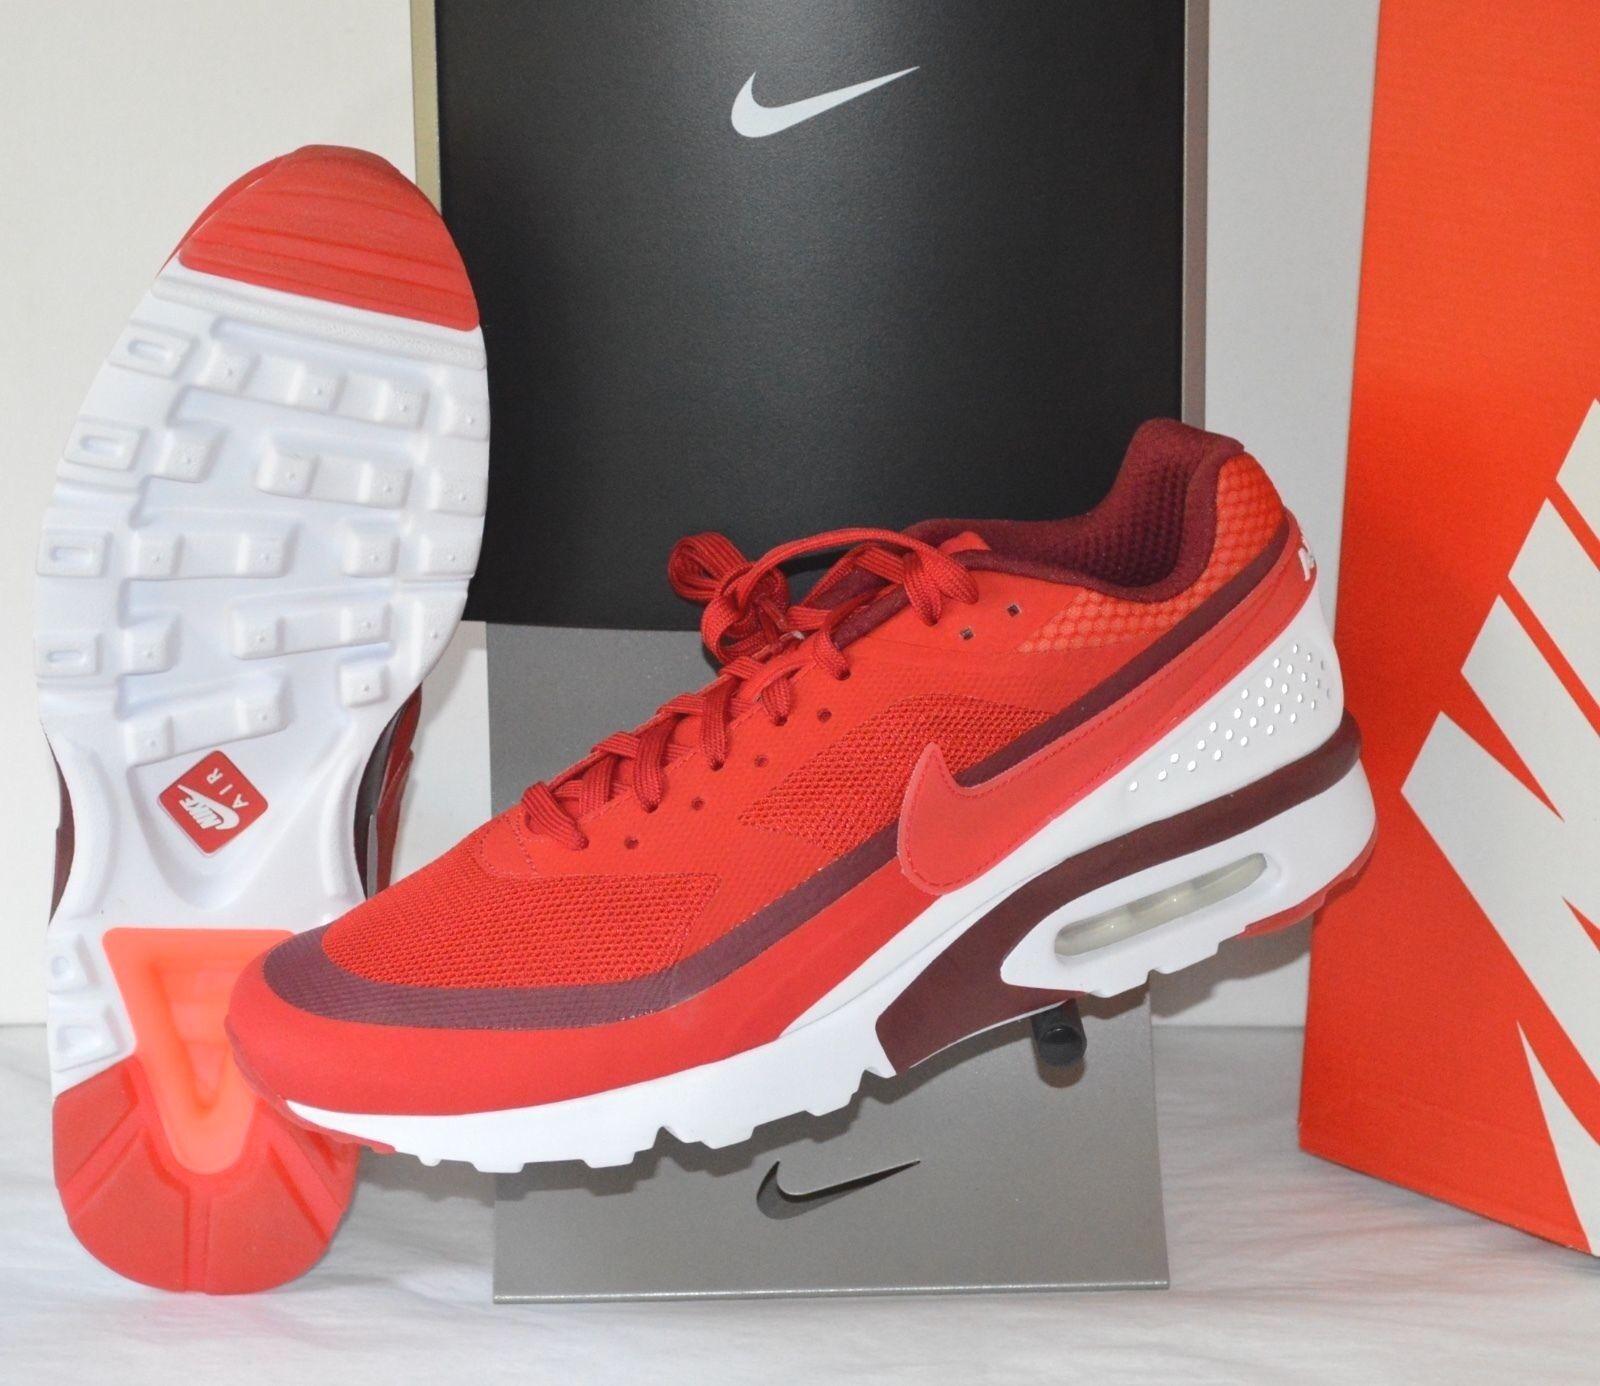 New  130 Nike Air Max BW Ultra University Red Bright Crimson sz 12 AIRMAX 90